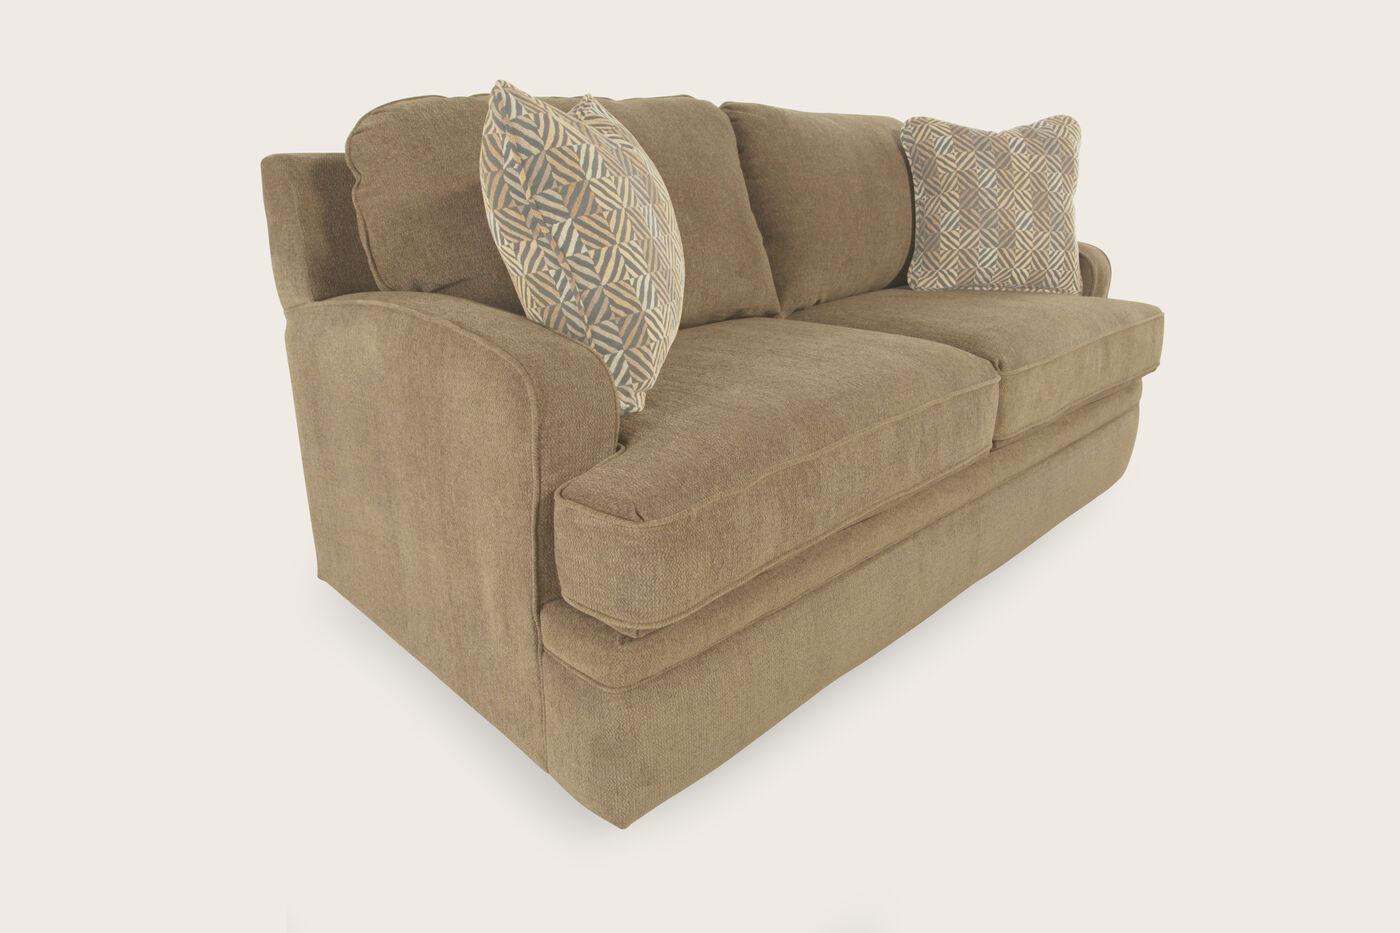 La z boy diana sesame full sleeper sofa mathis brothers for La z boy sectional sleeper sofa